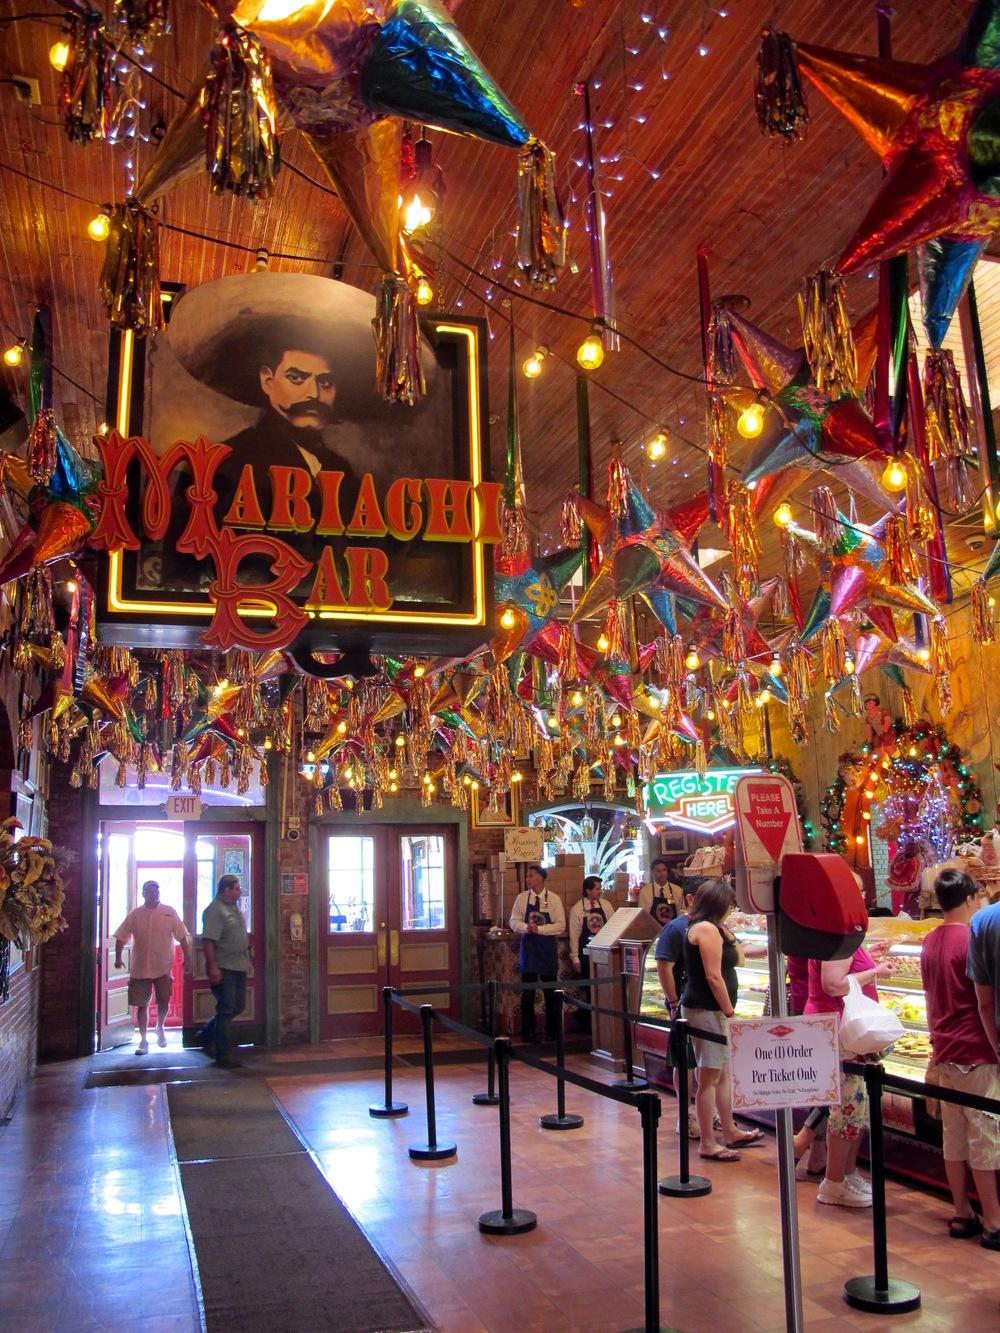 Mi Tierra Cafe and Bakery, Historic Market Square, San Antonio, Texas